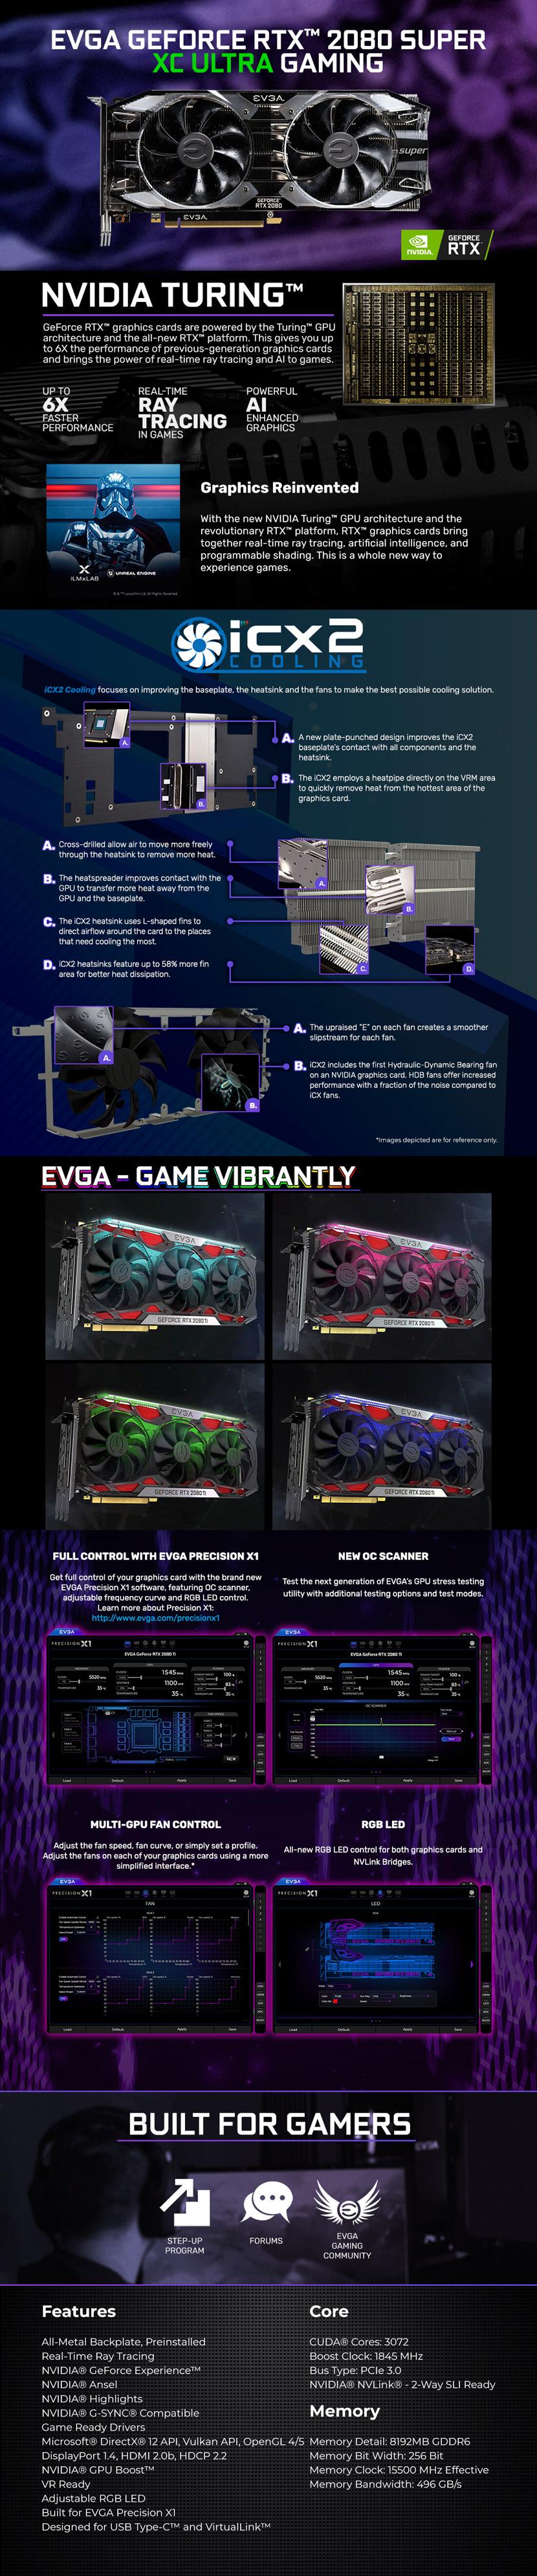 EVGA GeForce RTX 2080 SUPER XC ULTRA GAMING